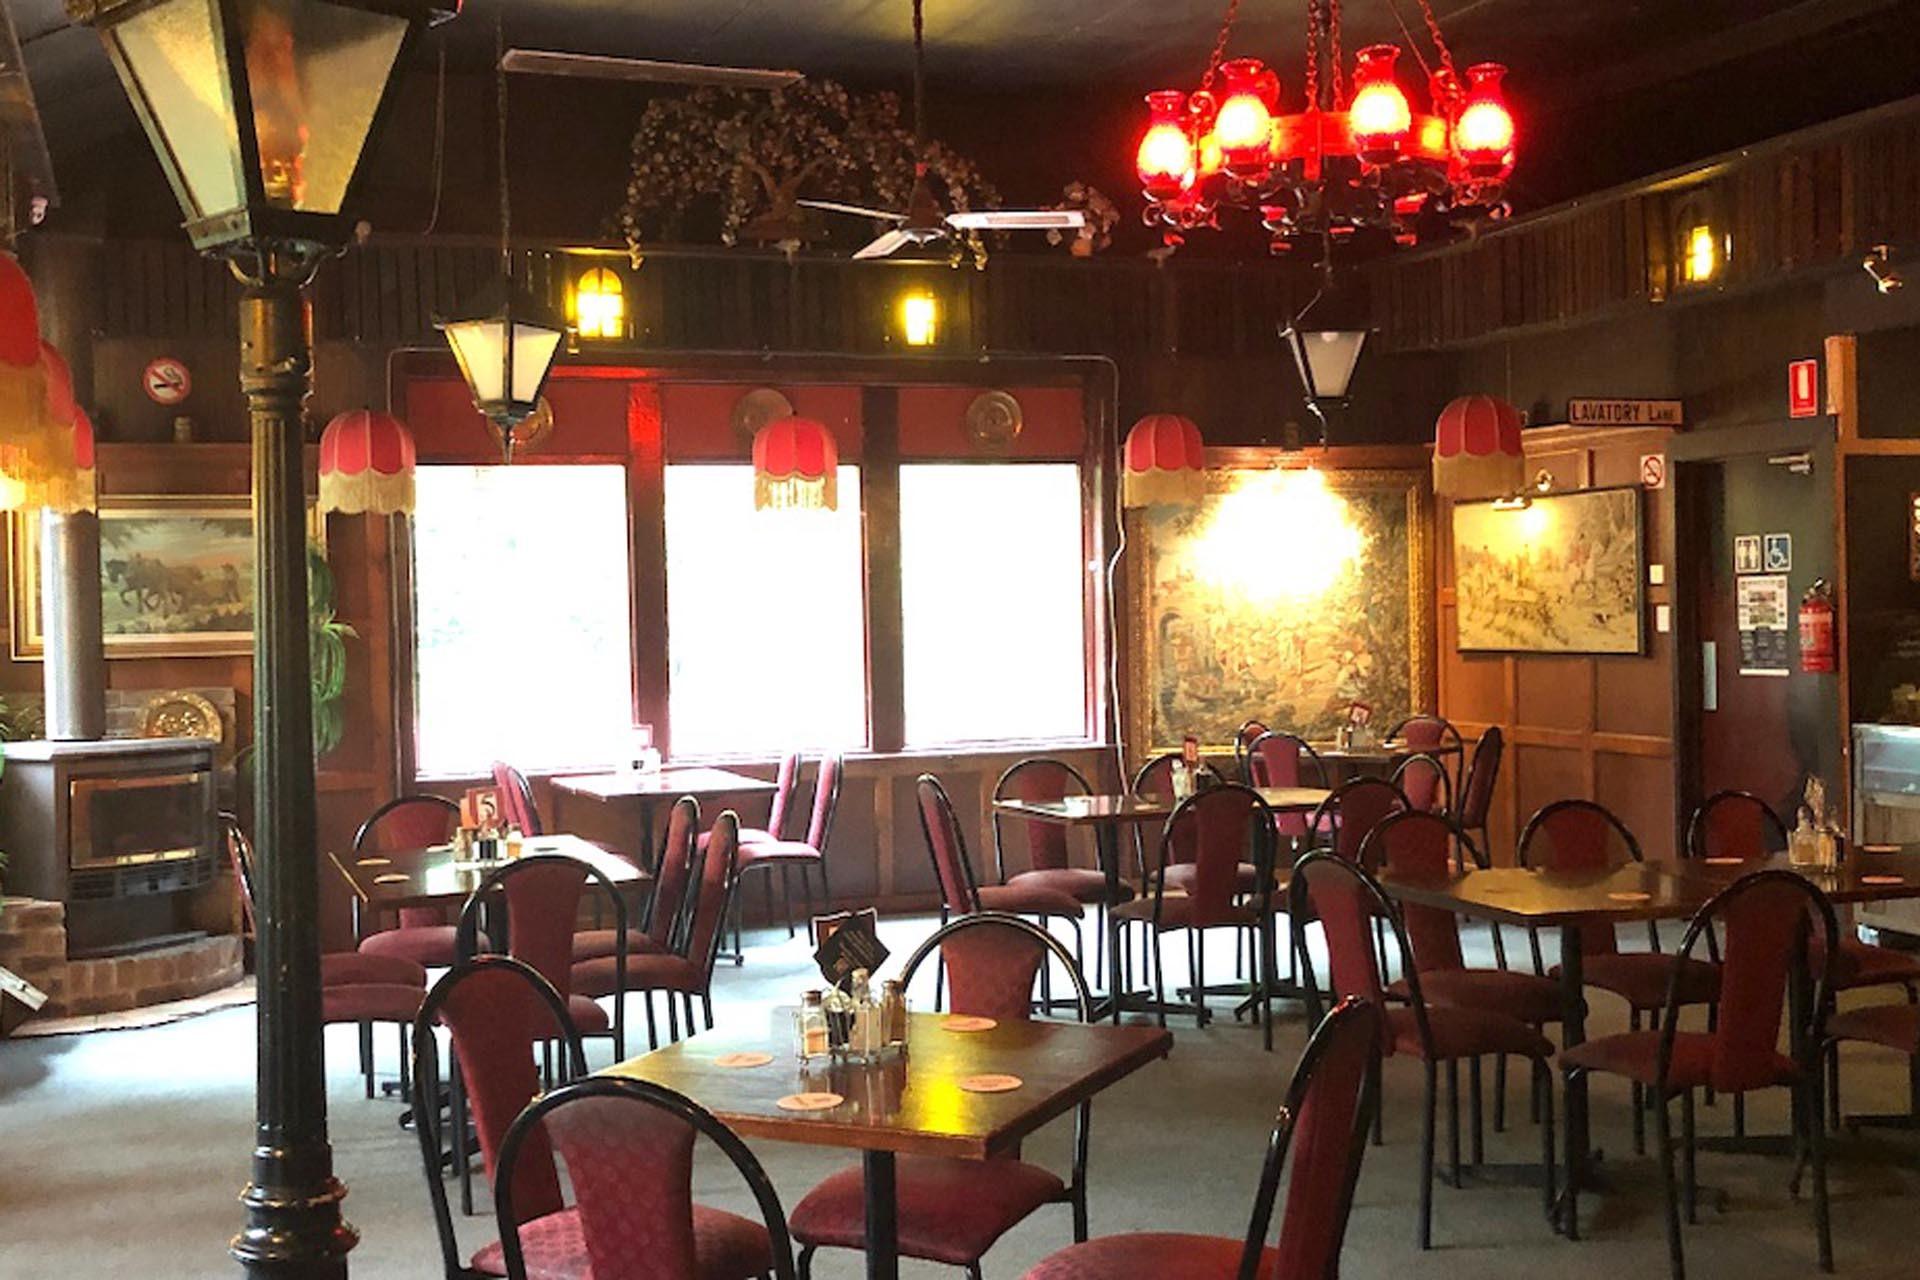 c - Micawber Tavern